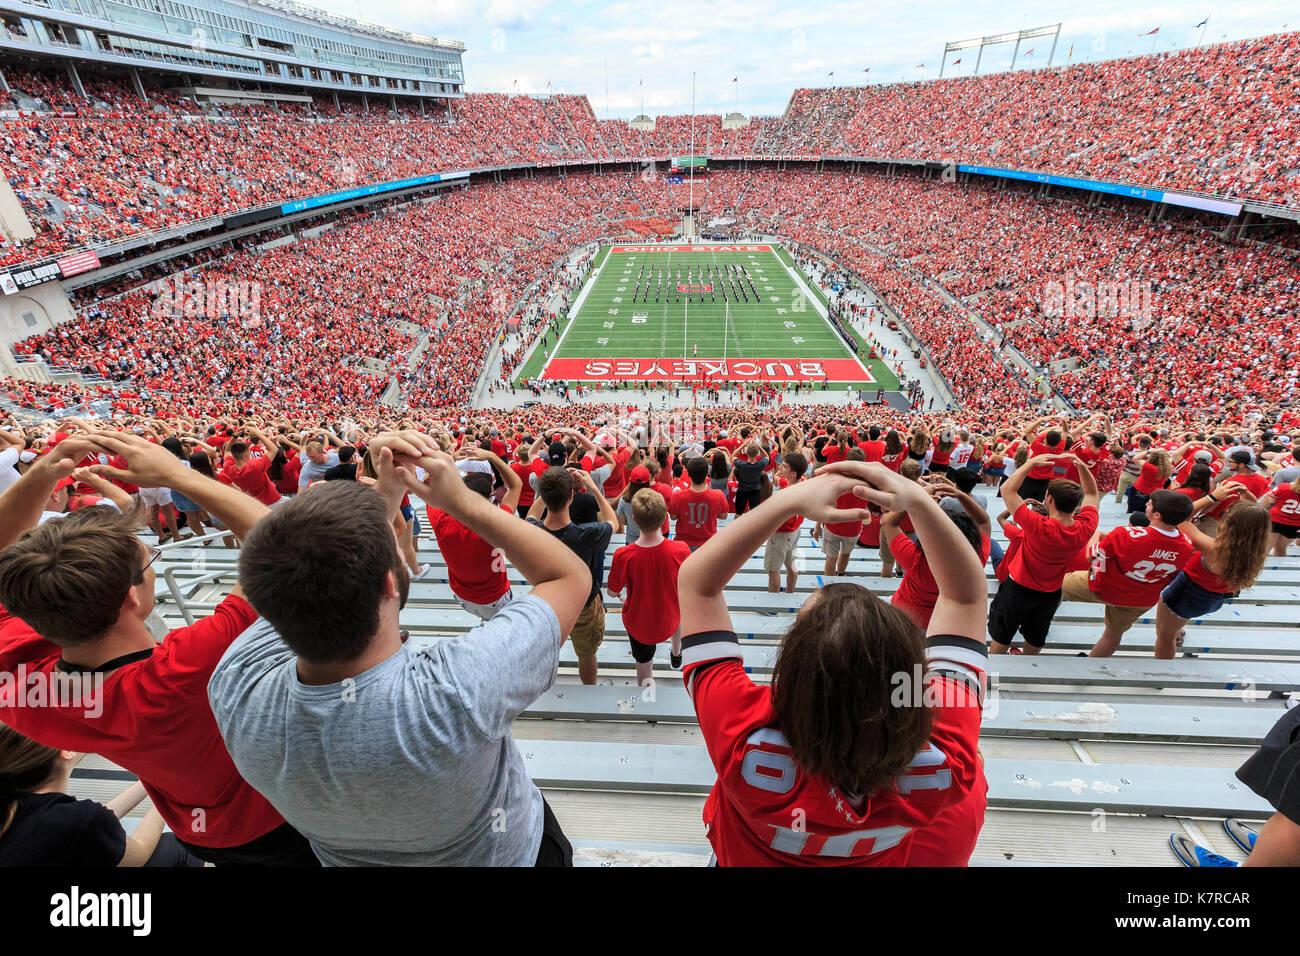 College football stadium fans